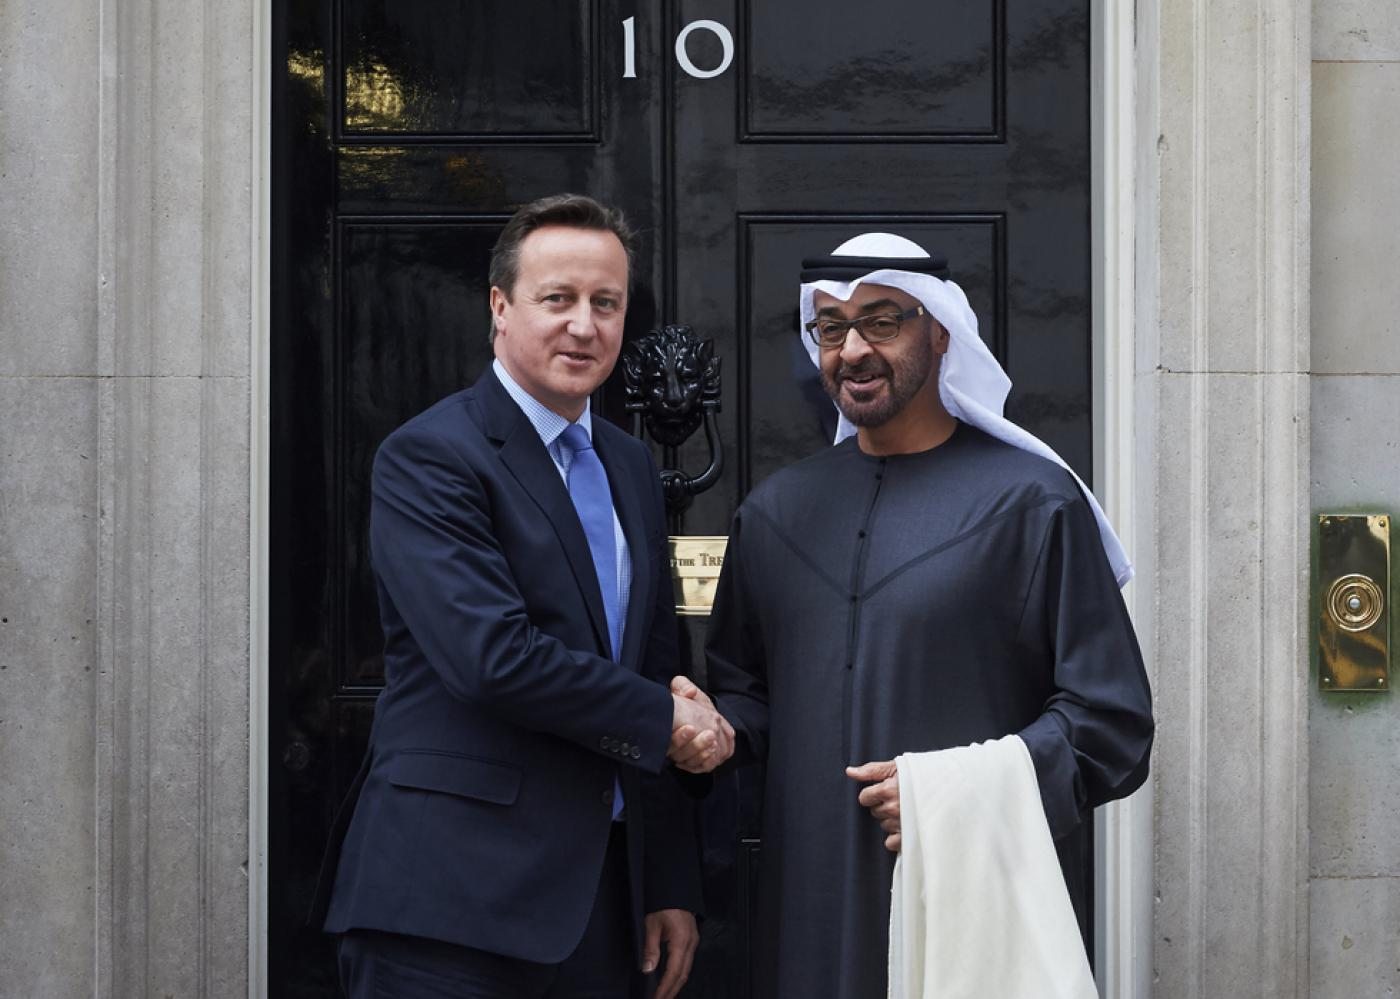 UAE paid PR firm millions to brief UK journalists on Qatar